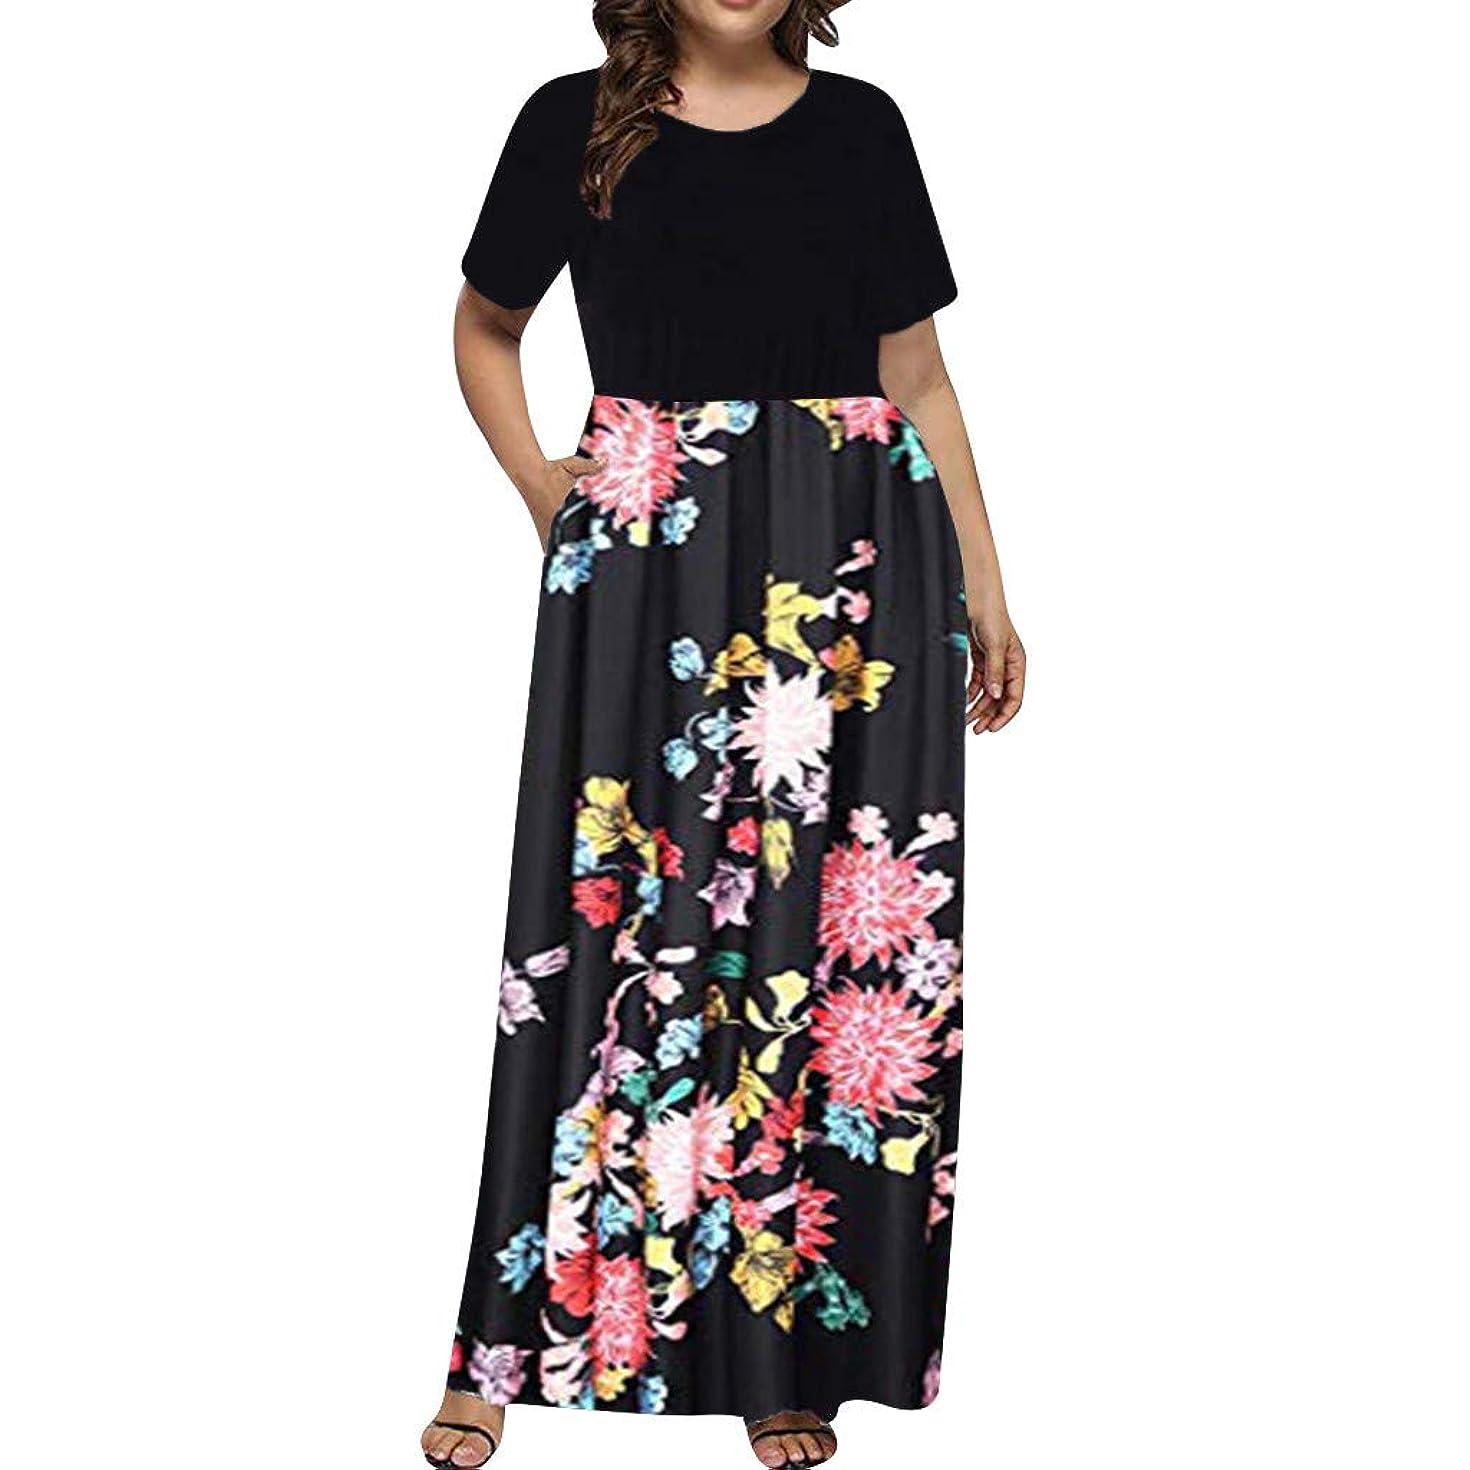 JDgoods_Women's Dress,Plus Size O-neck 3/4 Sleeve Stripe Summer Beach Long T-Shirt Dress,Solid Swing Dress Casual Loose Dress